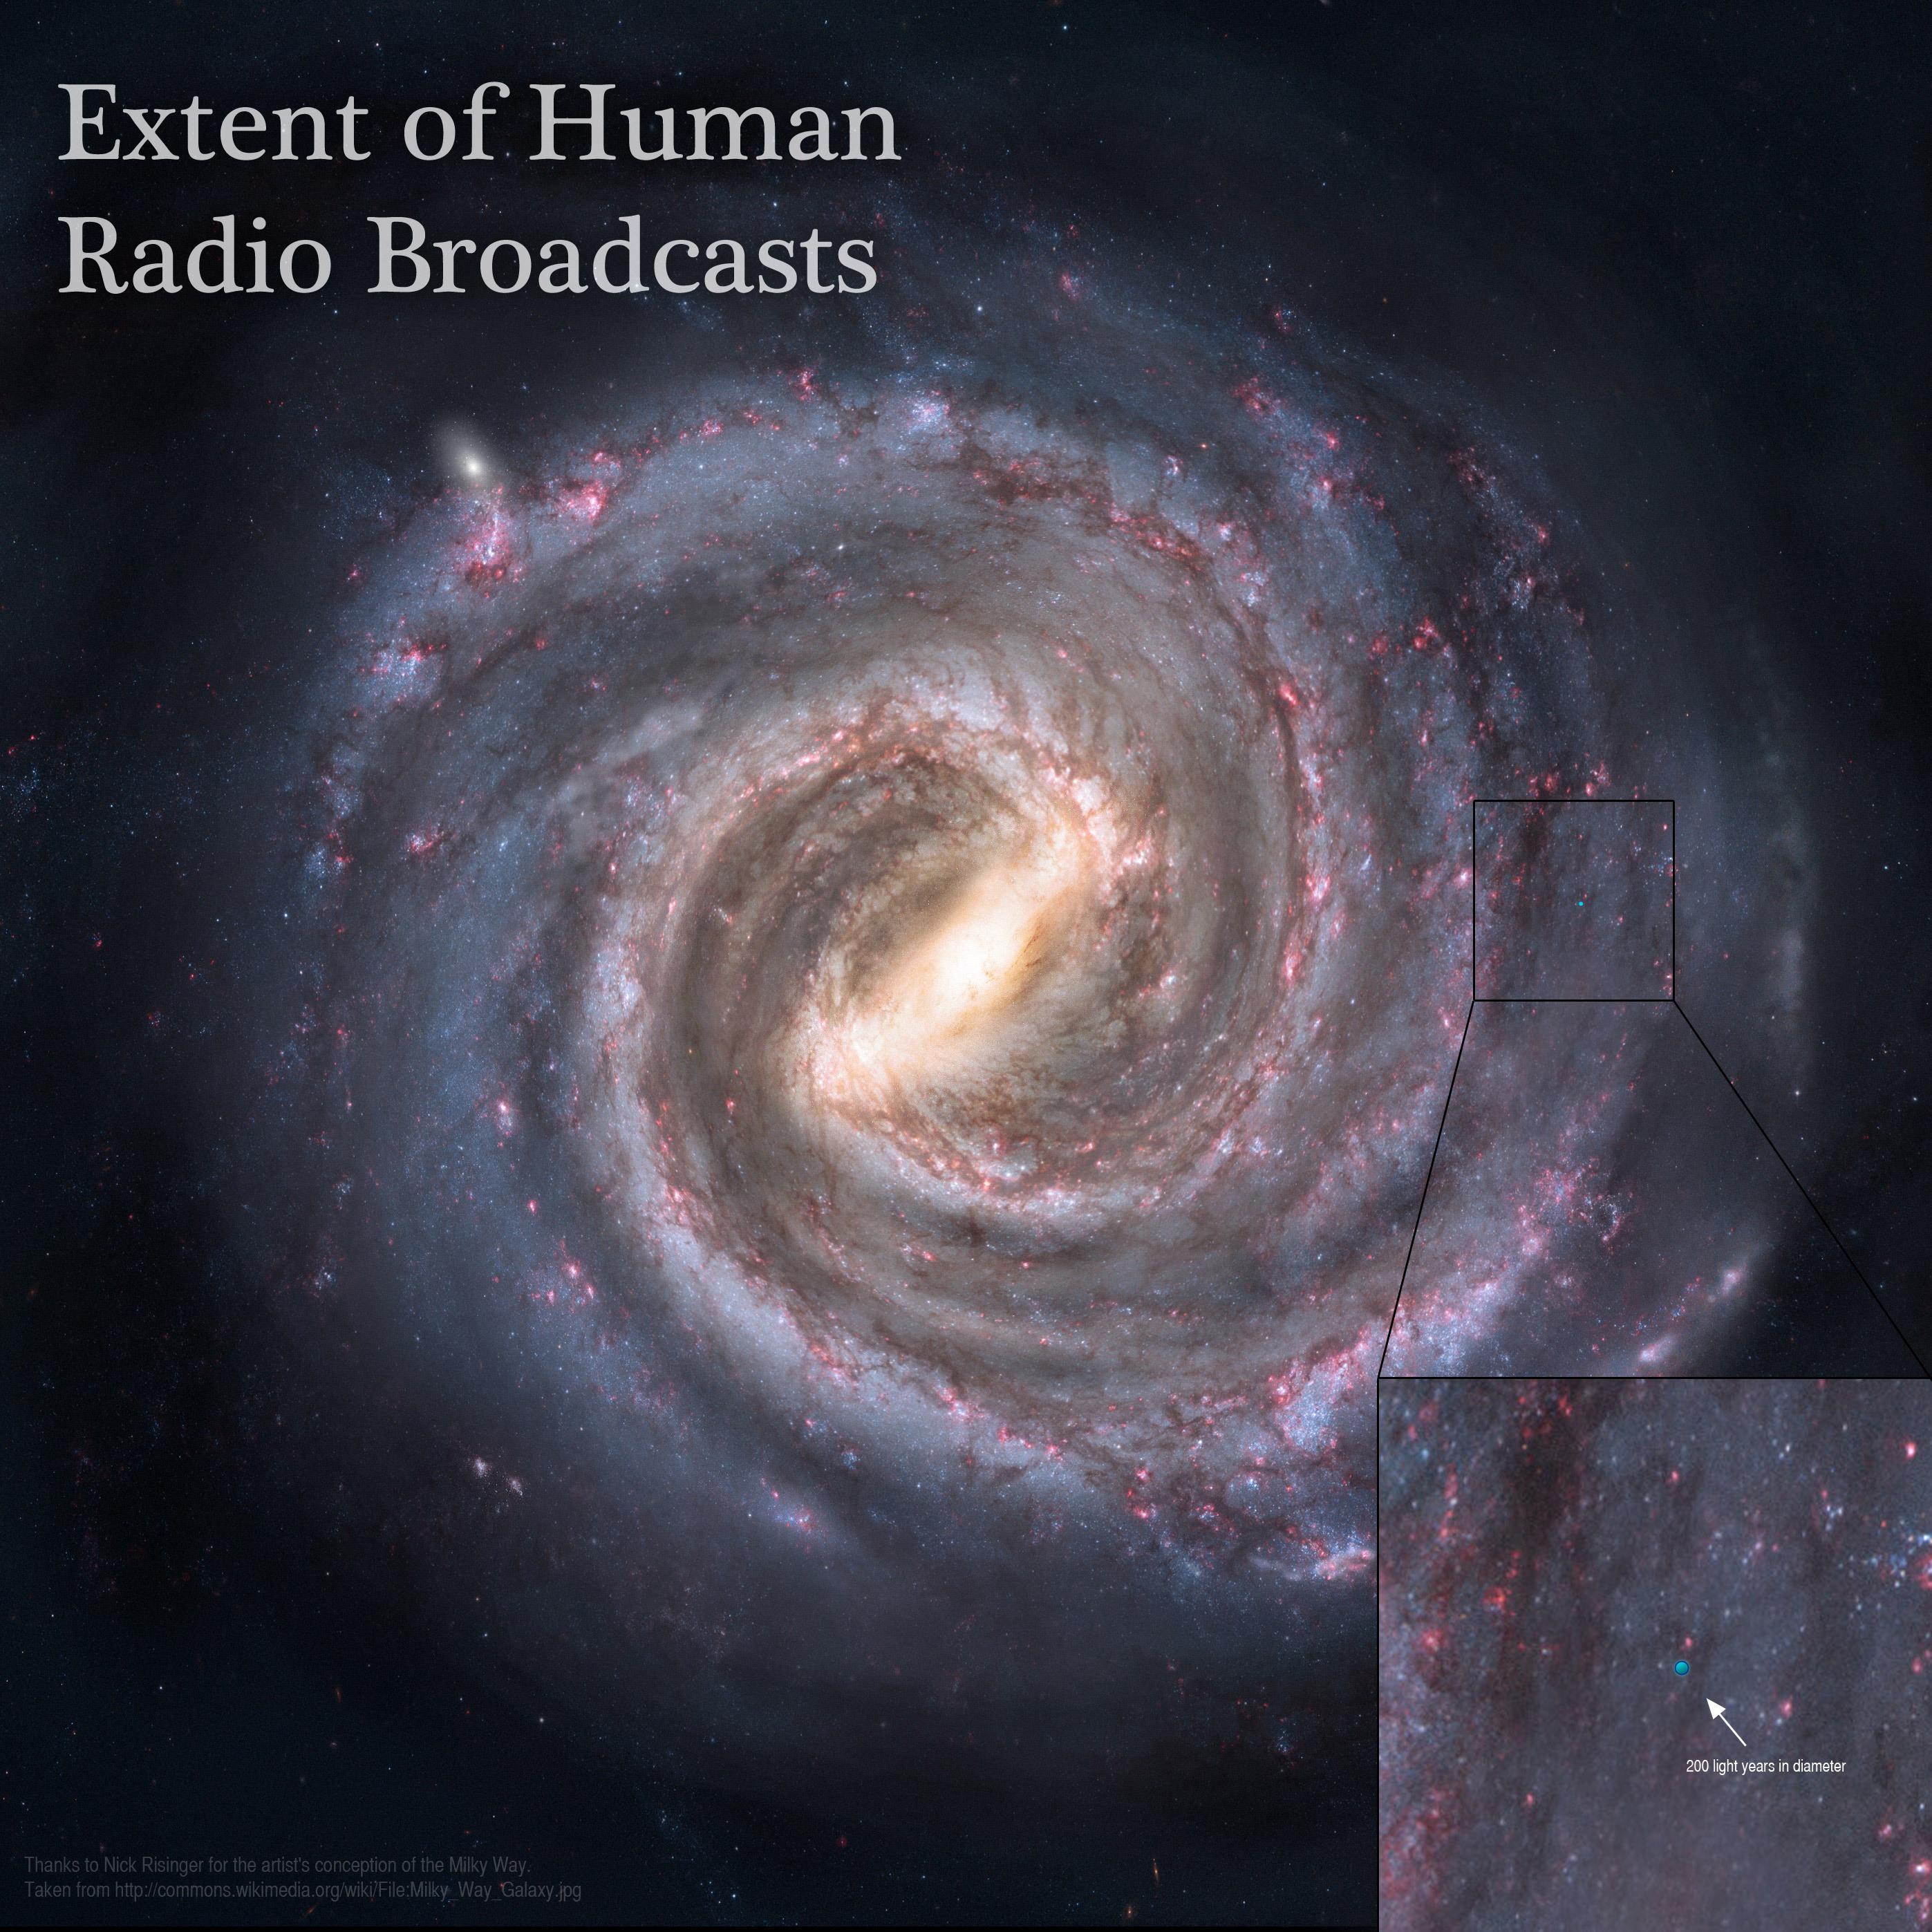 20130115_radio_broadcasts.jpg